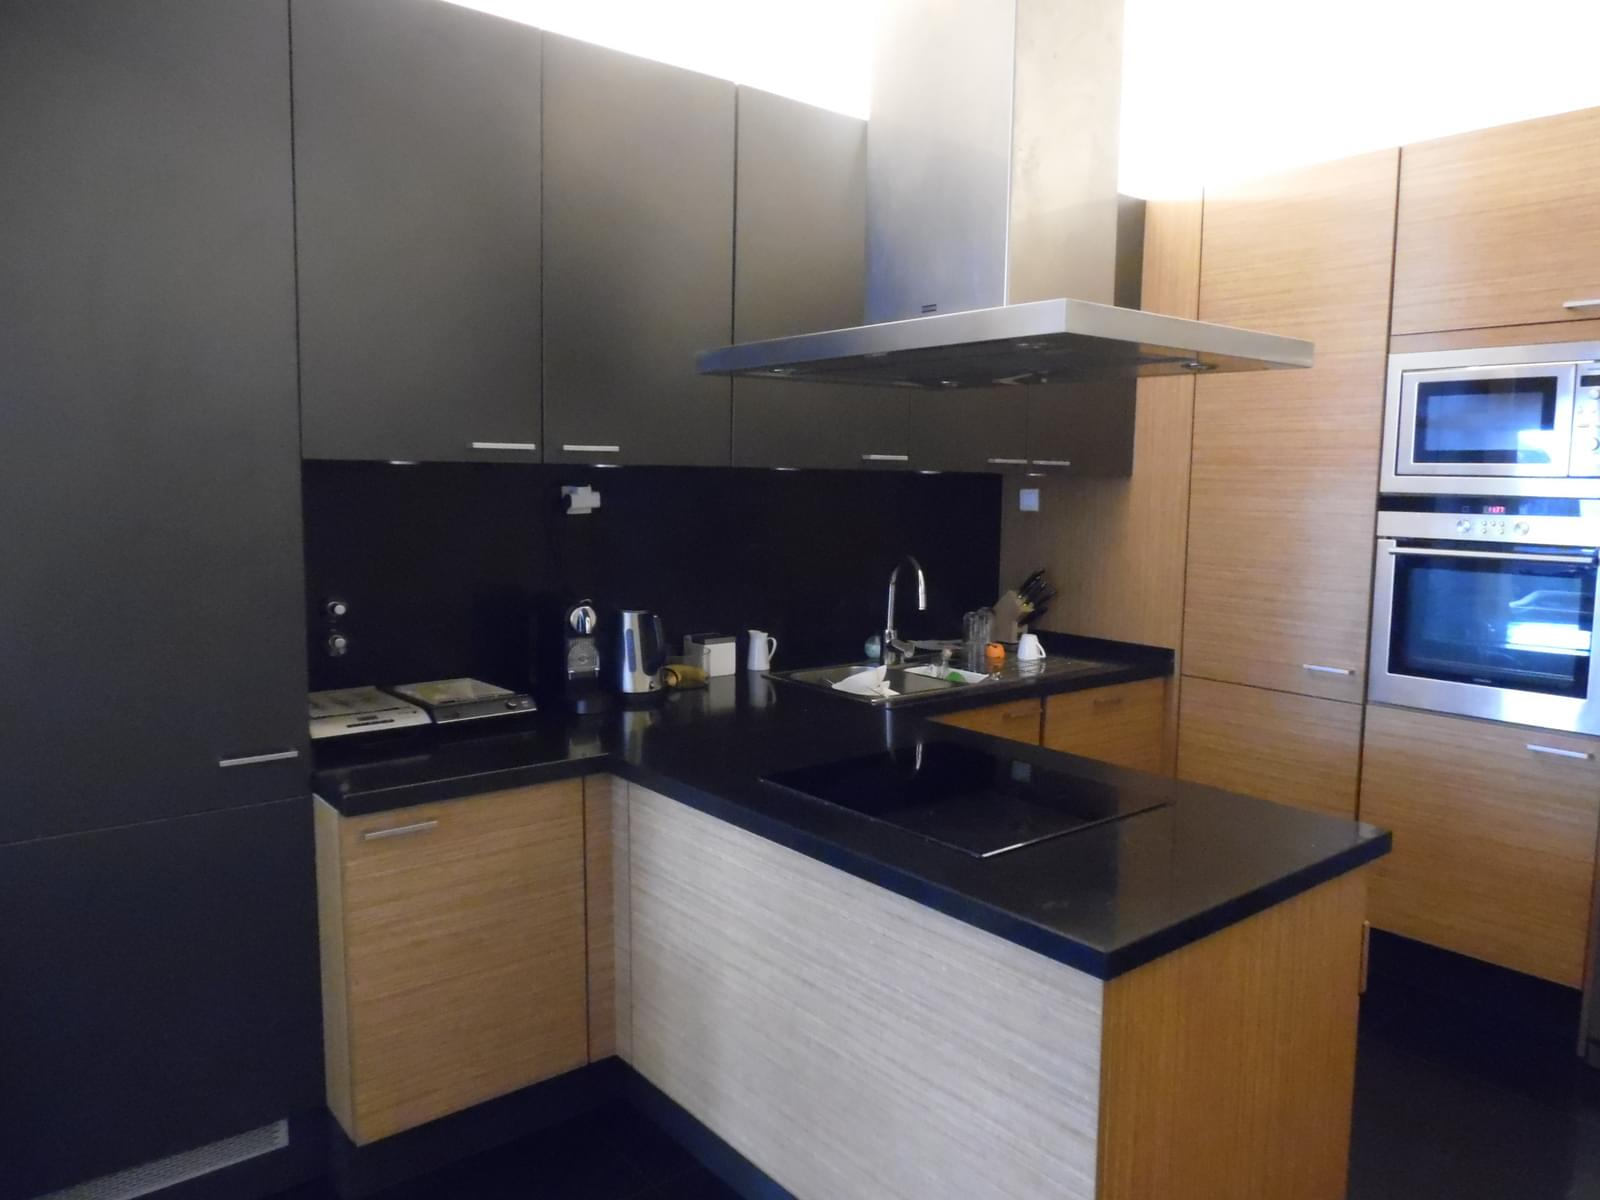 pf17454-apartamento-t4-lisboa-faf8f225-d731-4a6b-9f62-cded8fa5b2aa